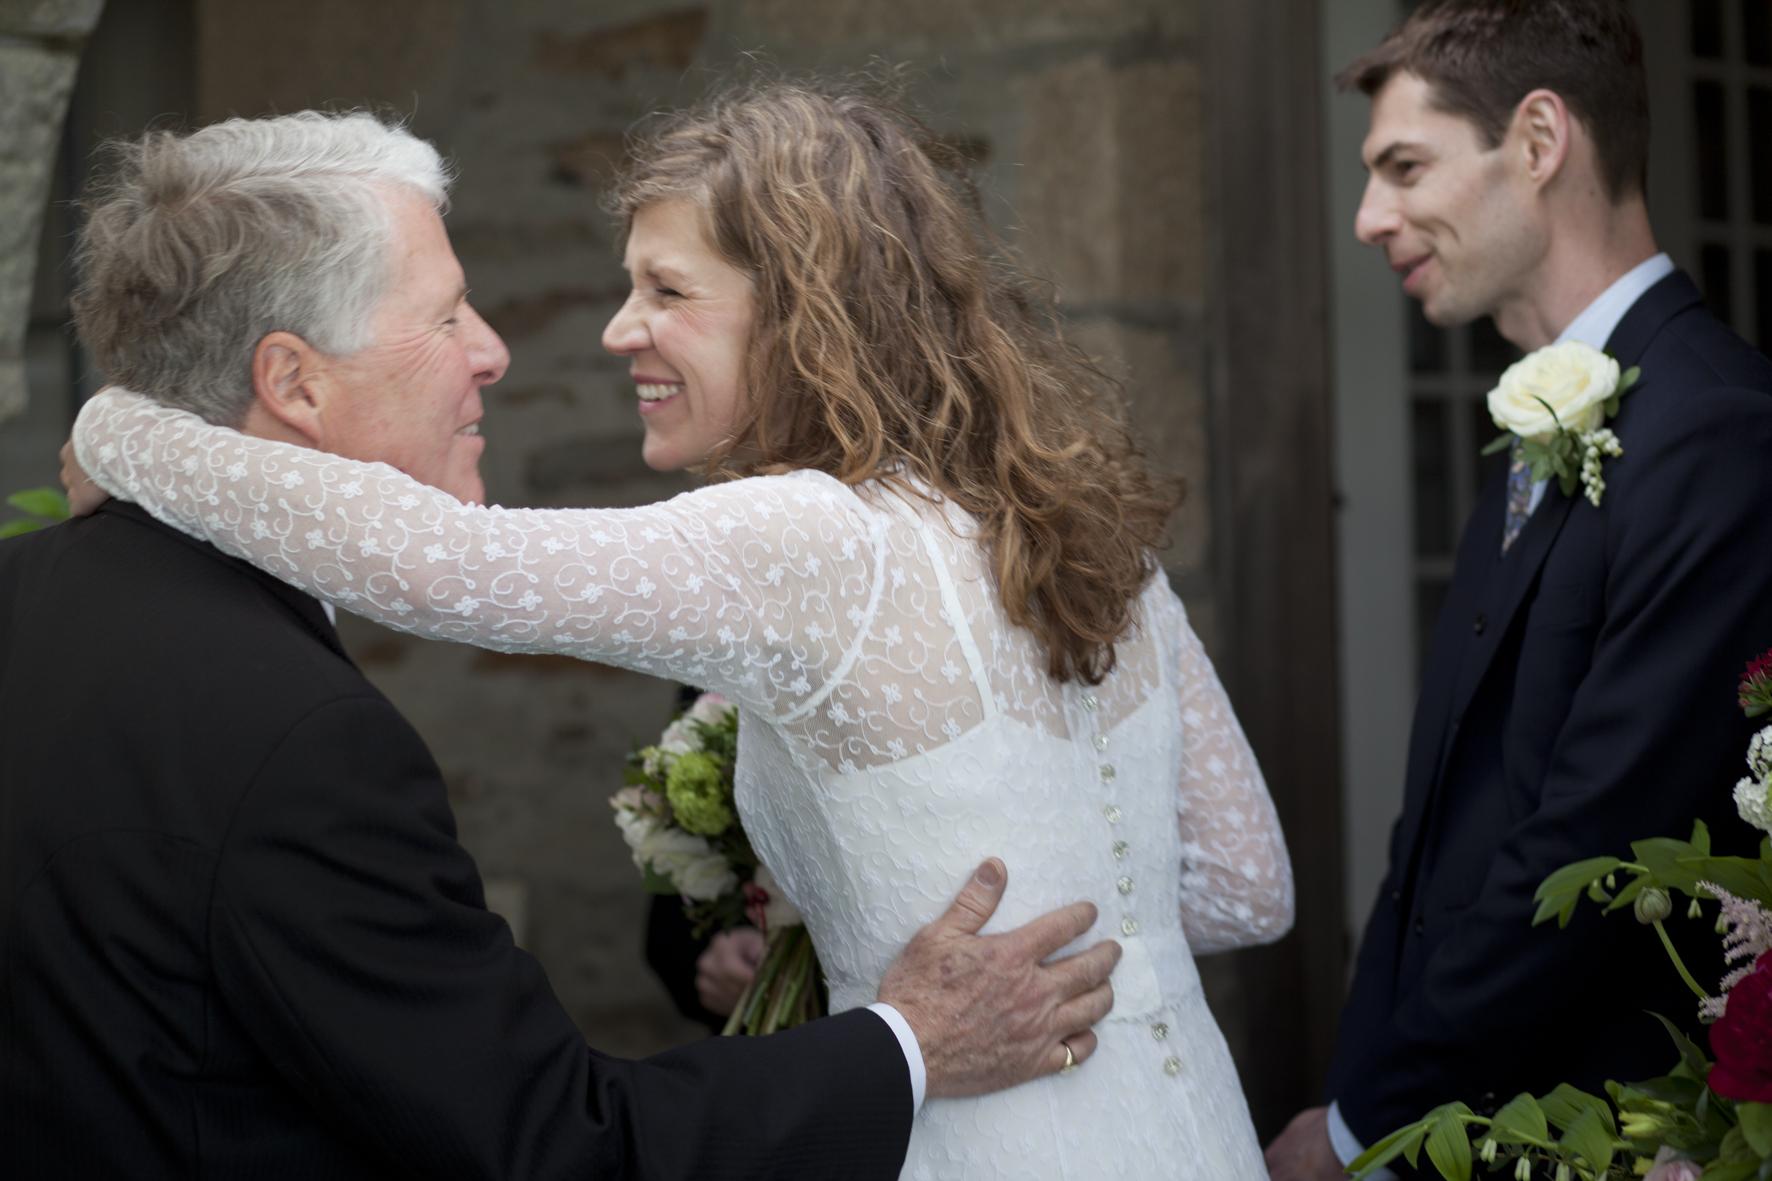 Wedding example_M&P__MG_3359_Claudia Leisinger.jpg